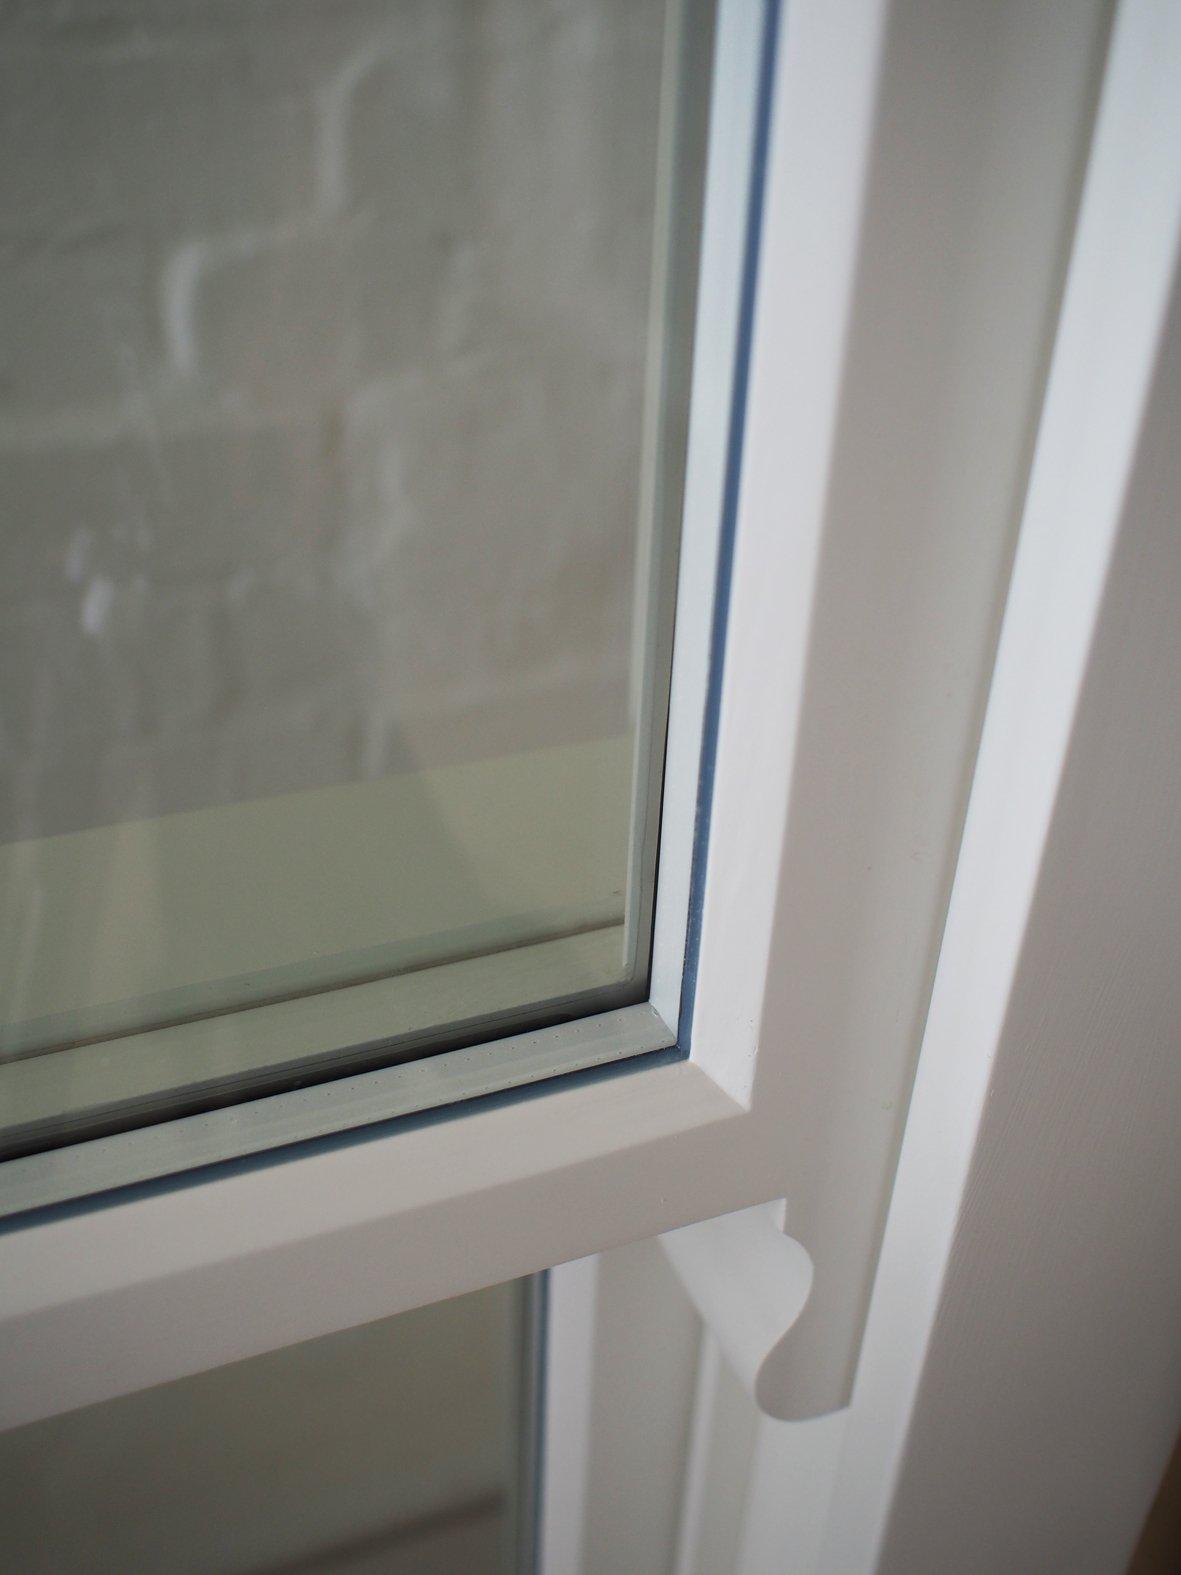 wooden sash windows spacer bar